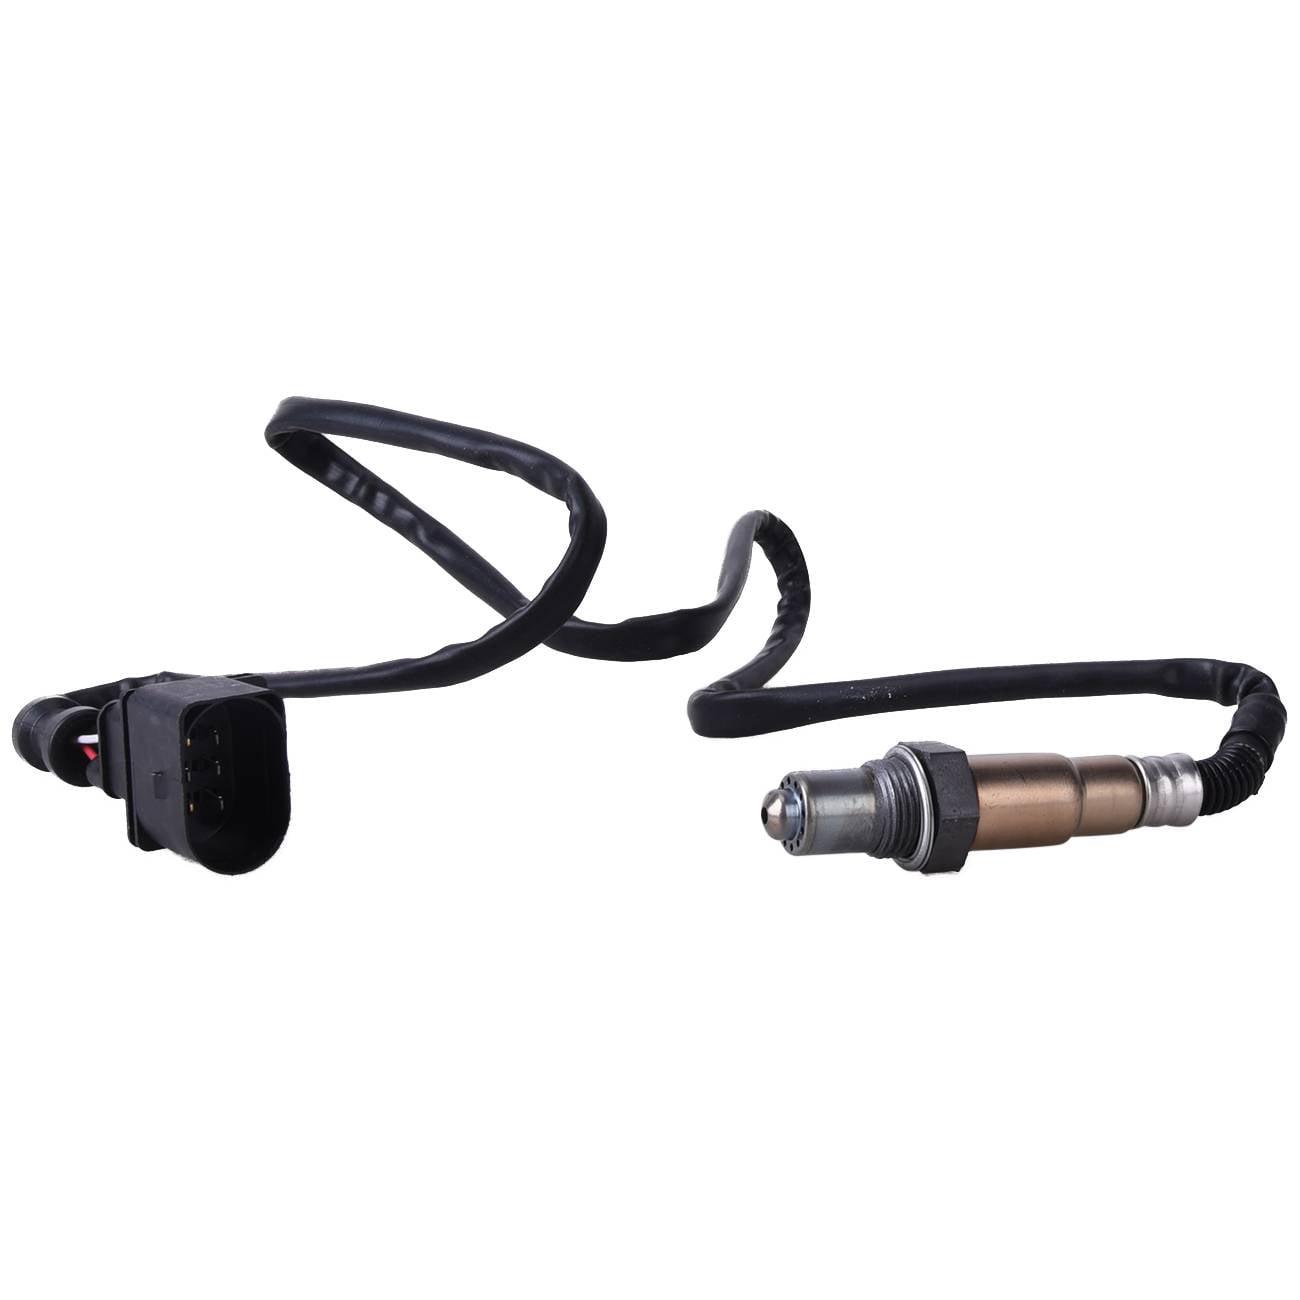 New Oxygen O2 Lambda Sensor for BMW E60 E61 E65 E66 545i 745i 760i 11787521705